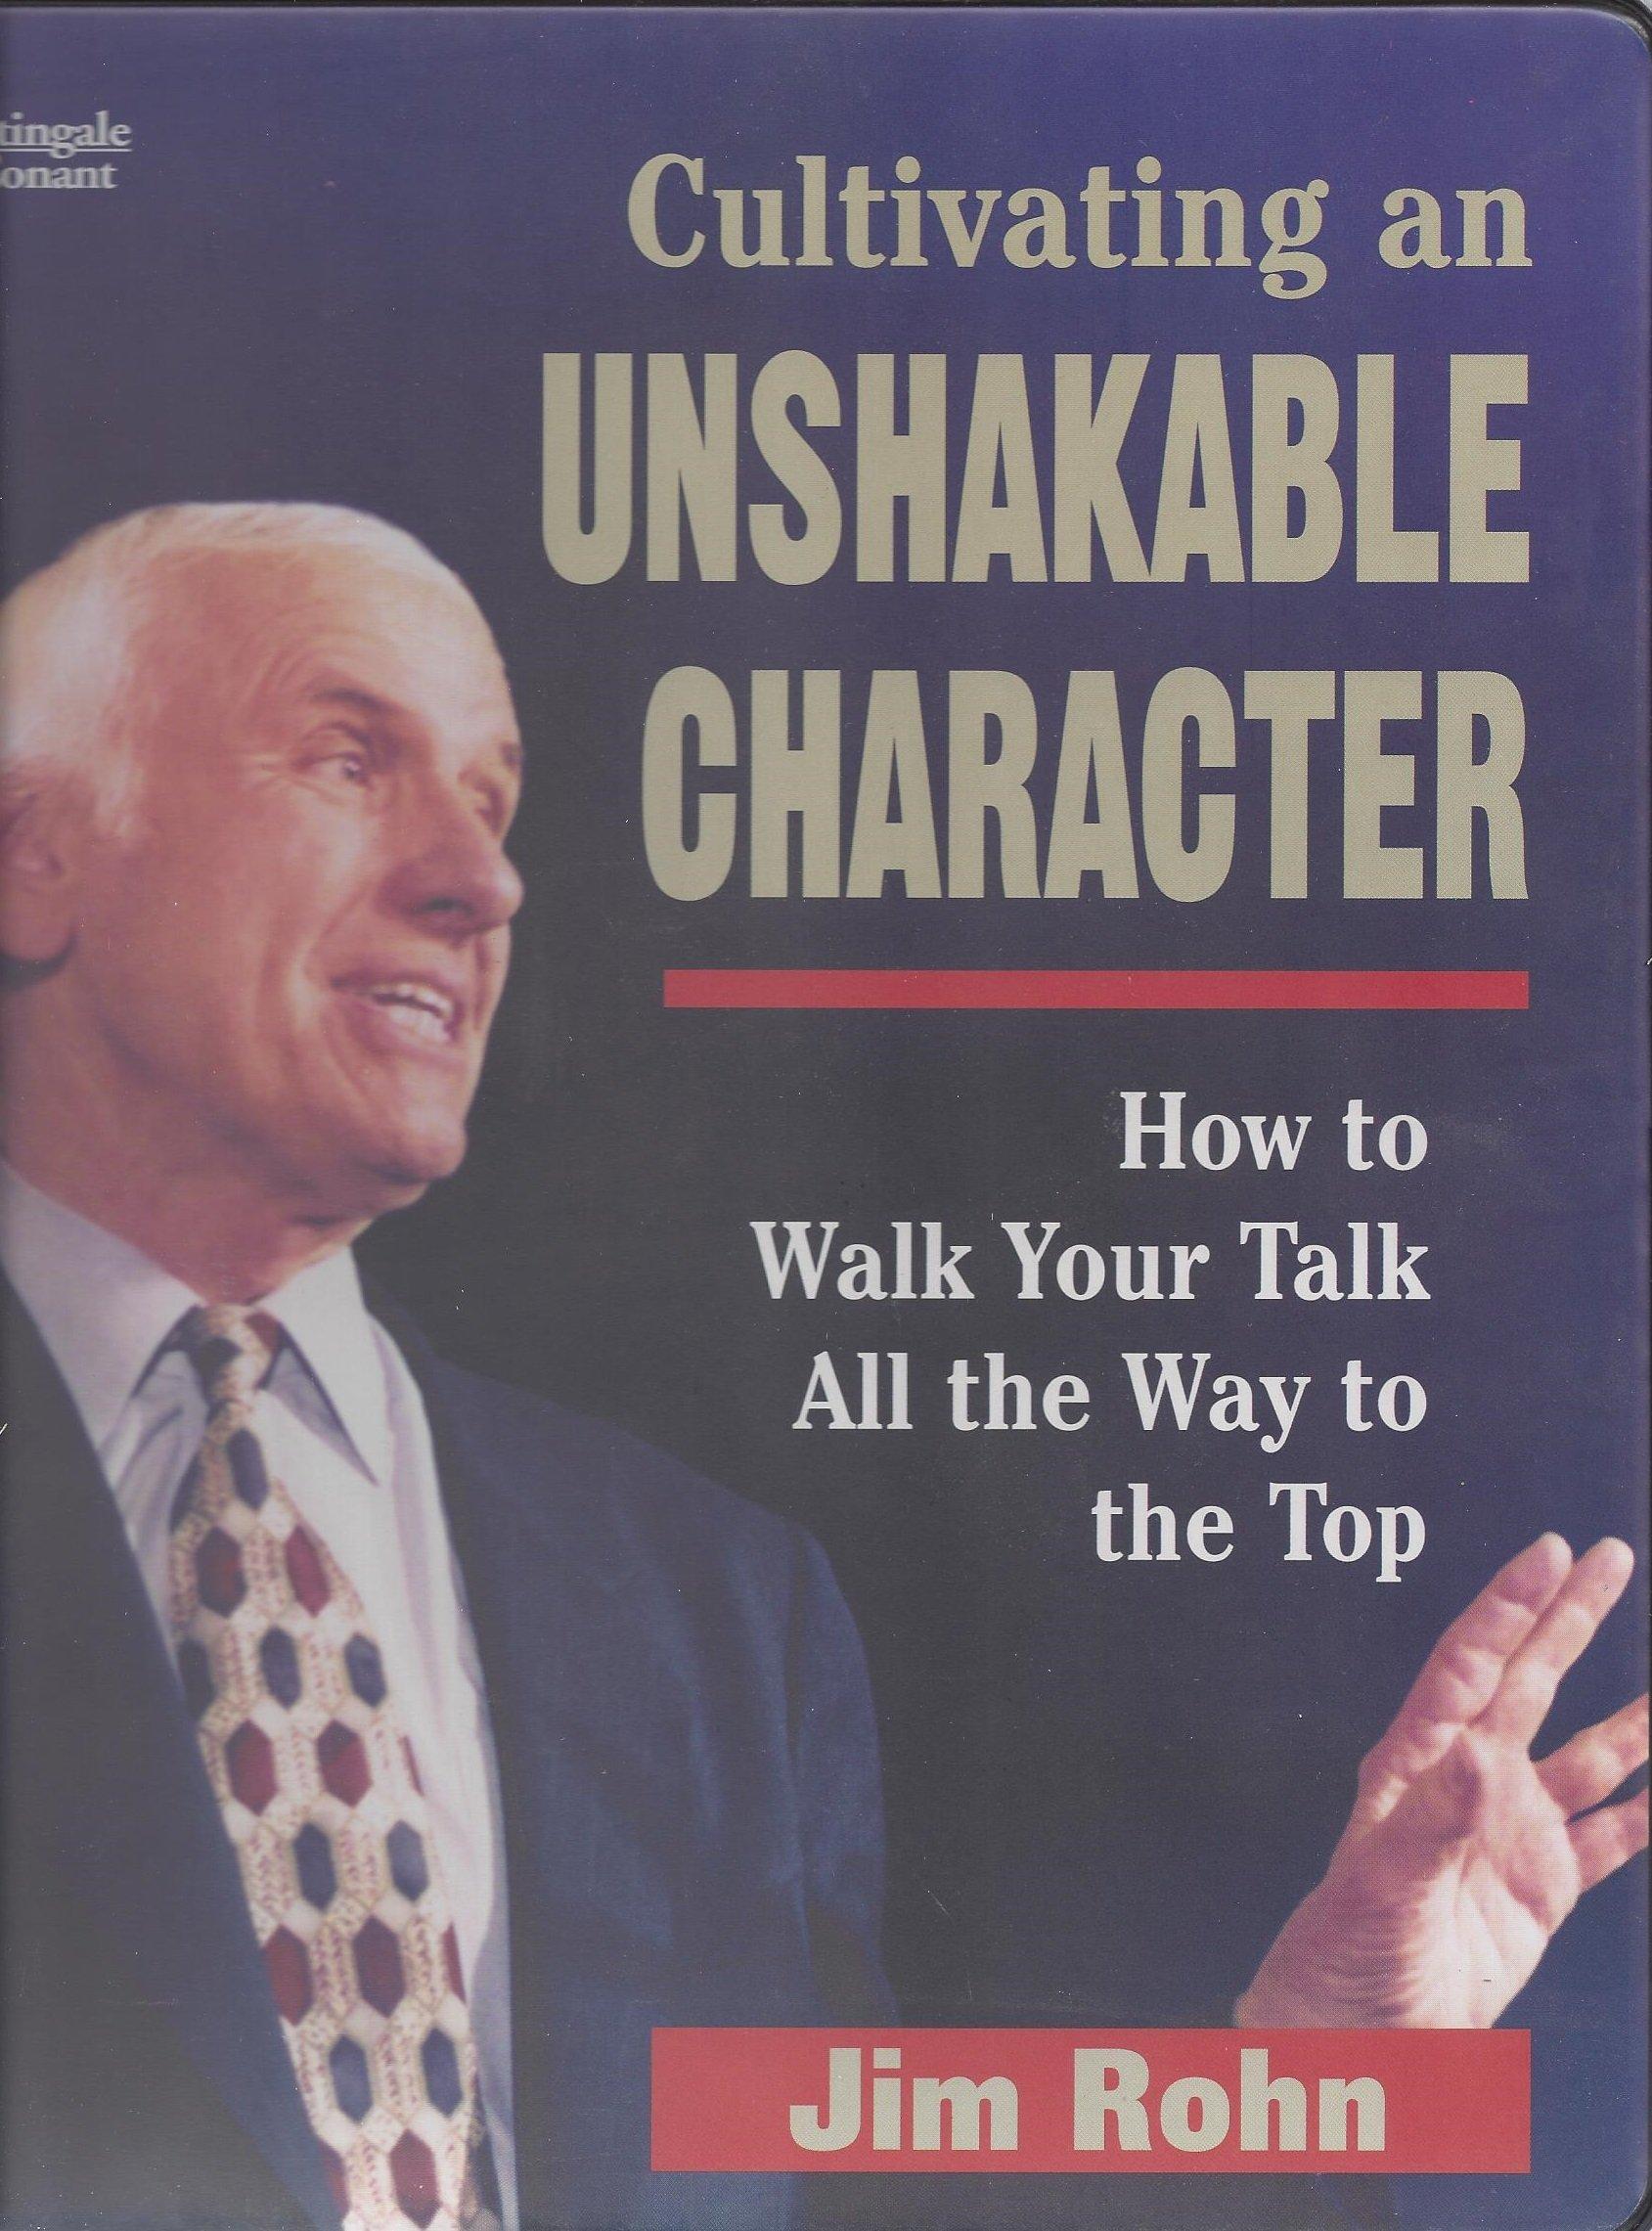 jim rohn cultivating an unshakable character